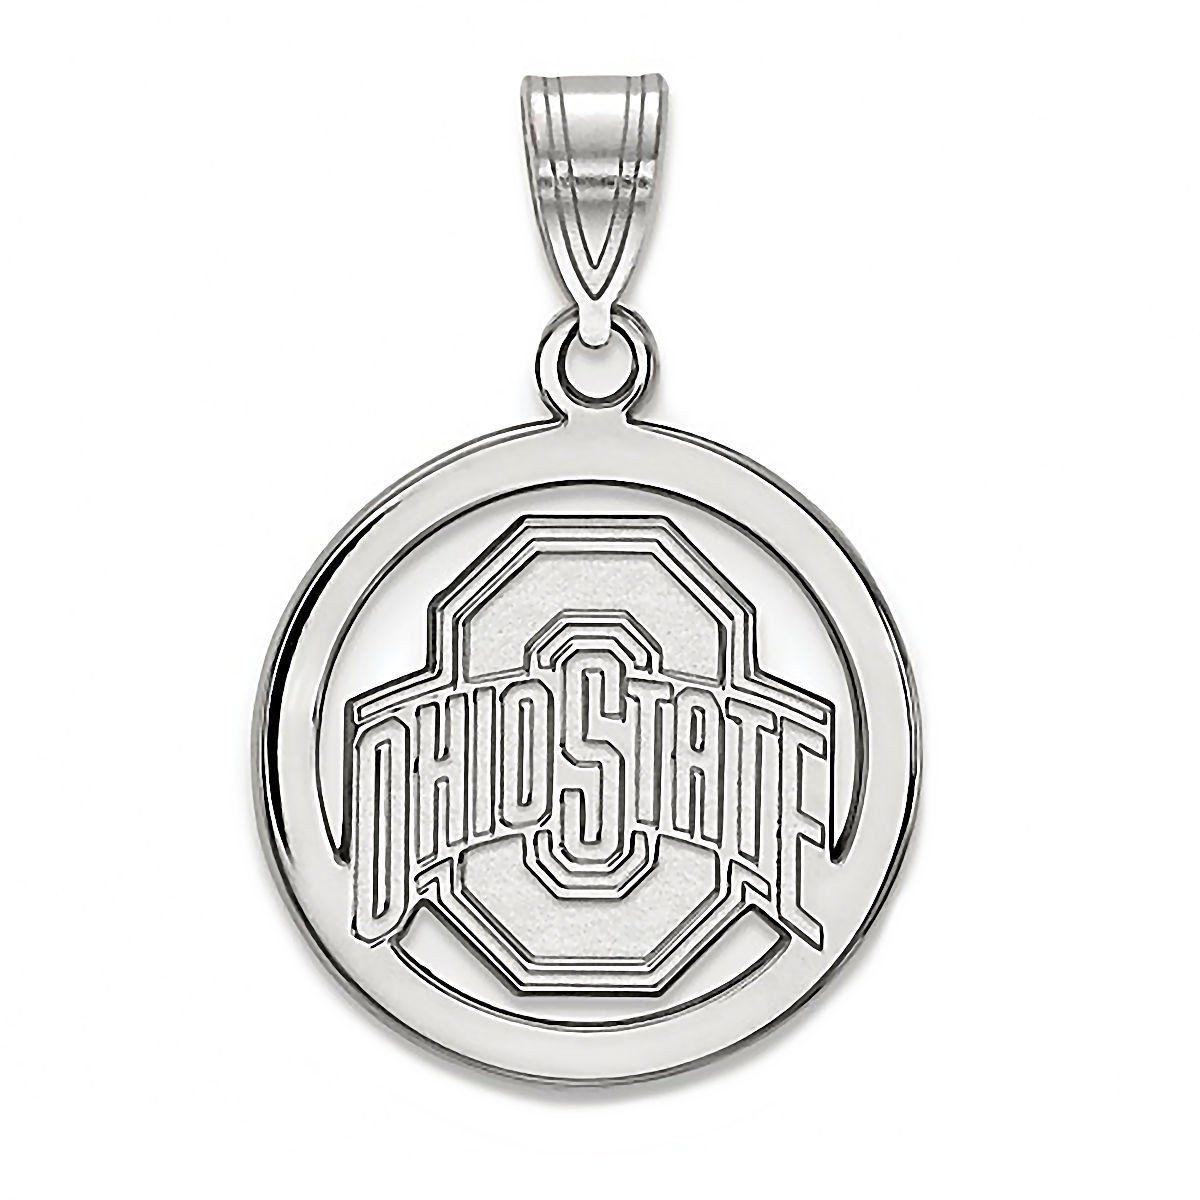 Logoart Sterling Silver Gp University Of North Carolina Tie Tac